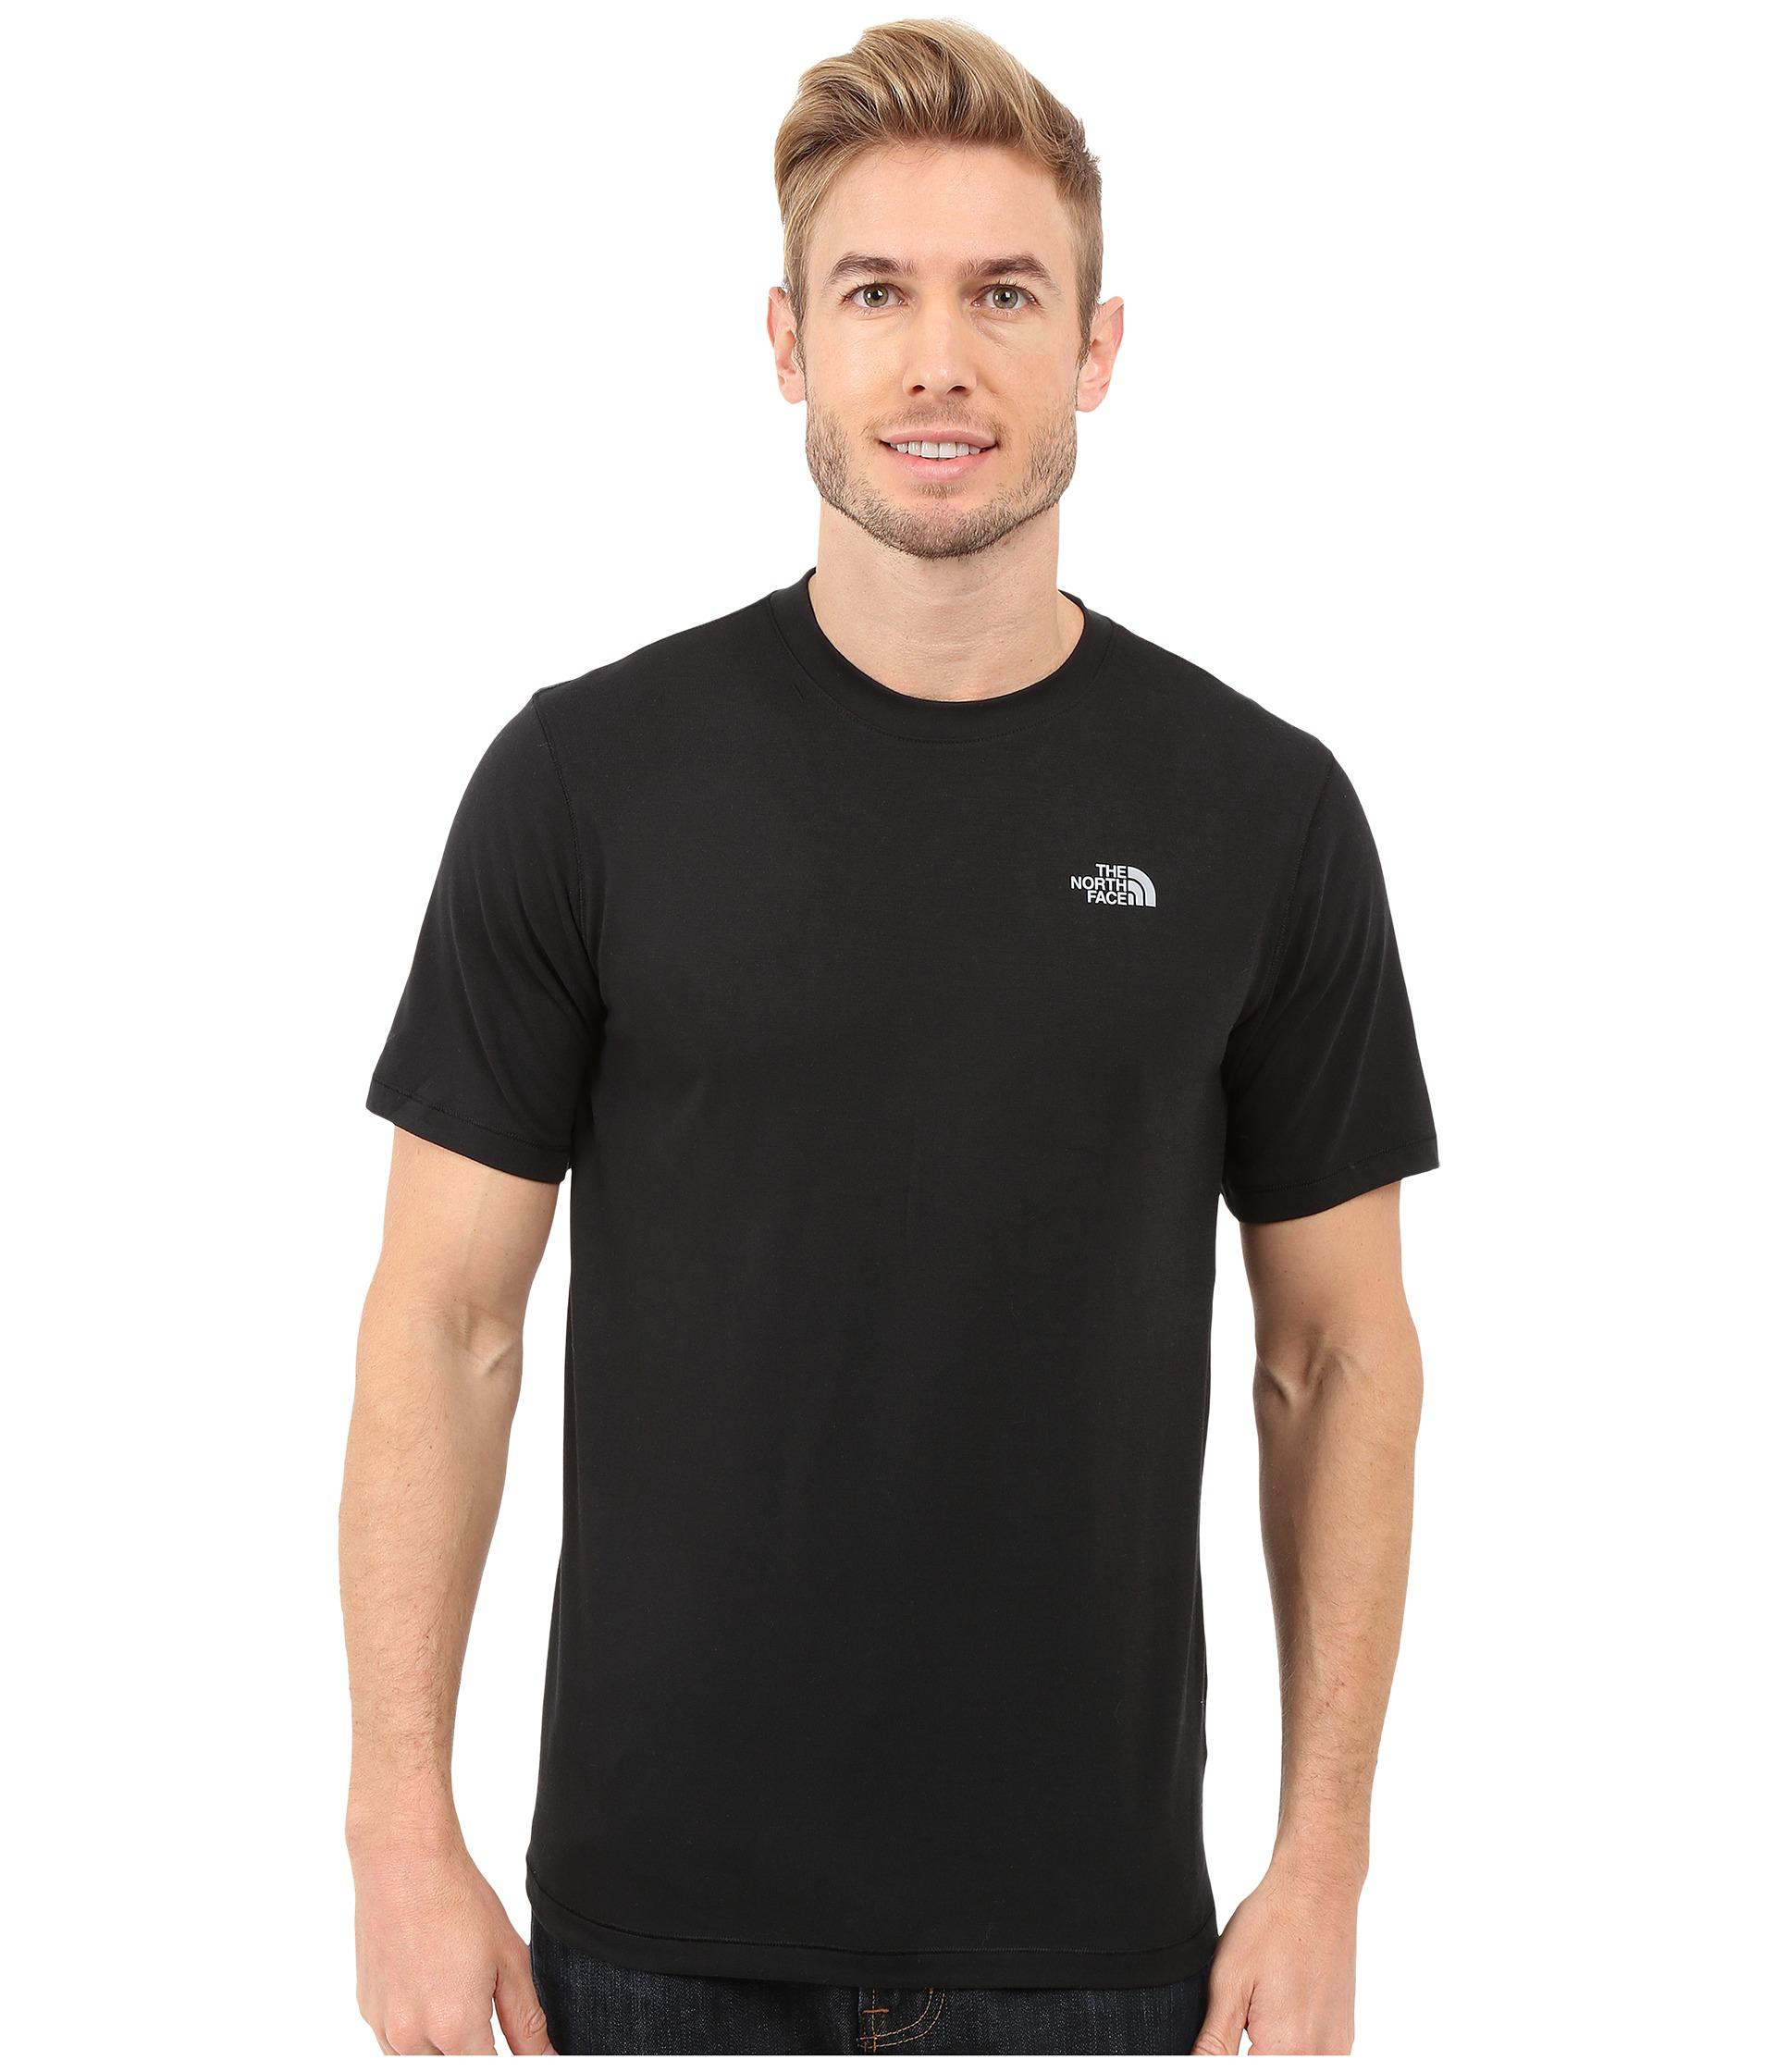 The north face easy logo short sleeve t shirt in black for for The north face short sleeve shirt